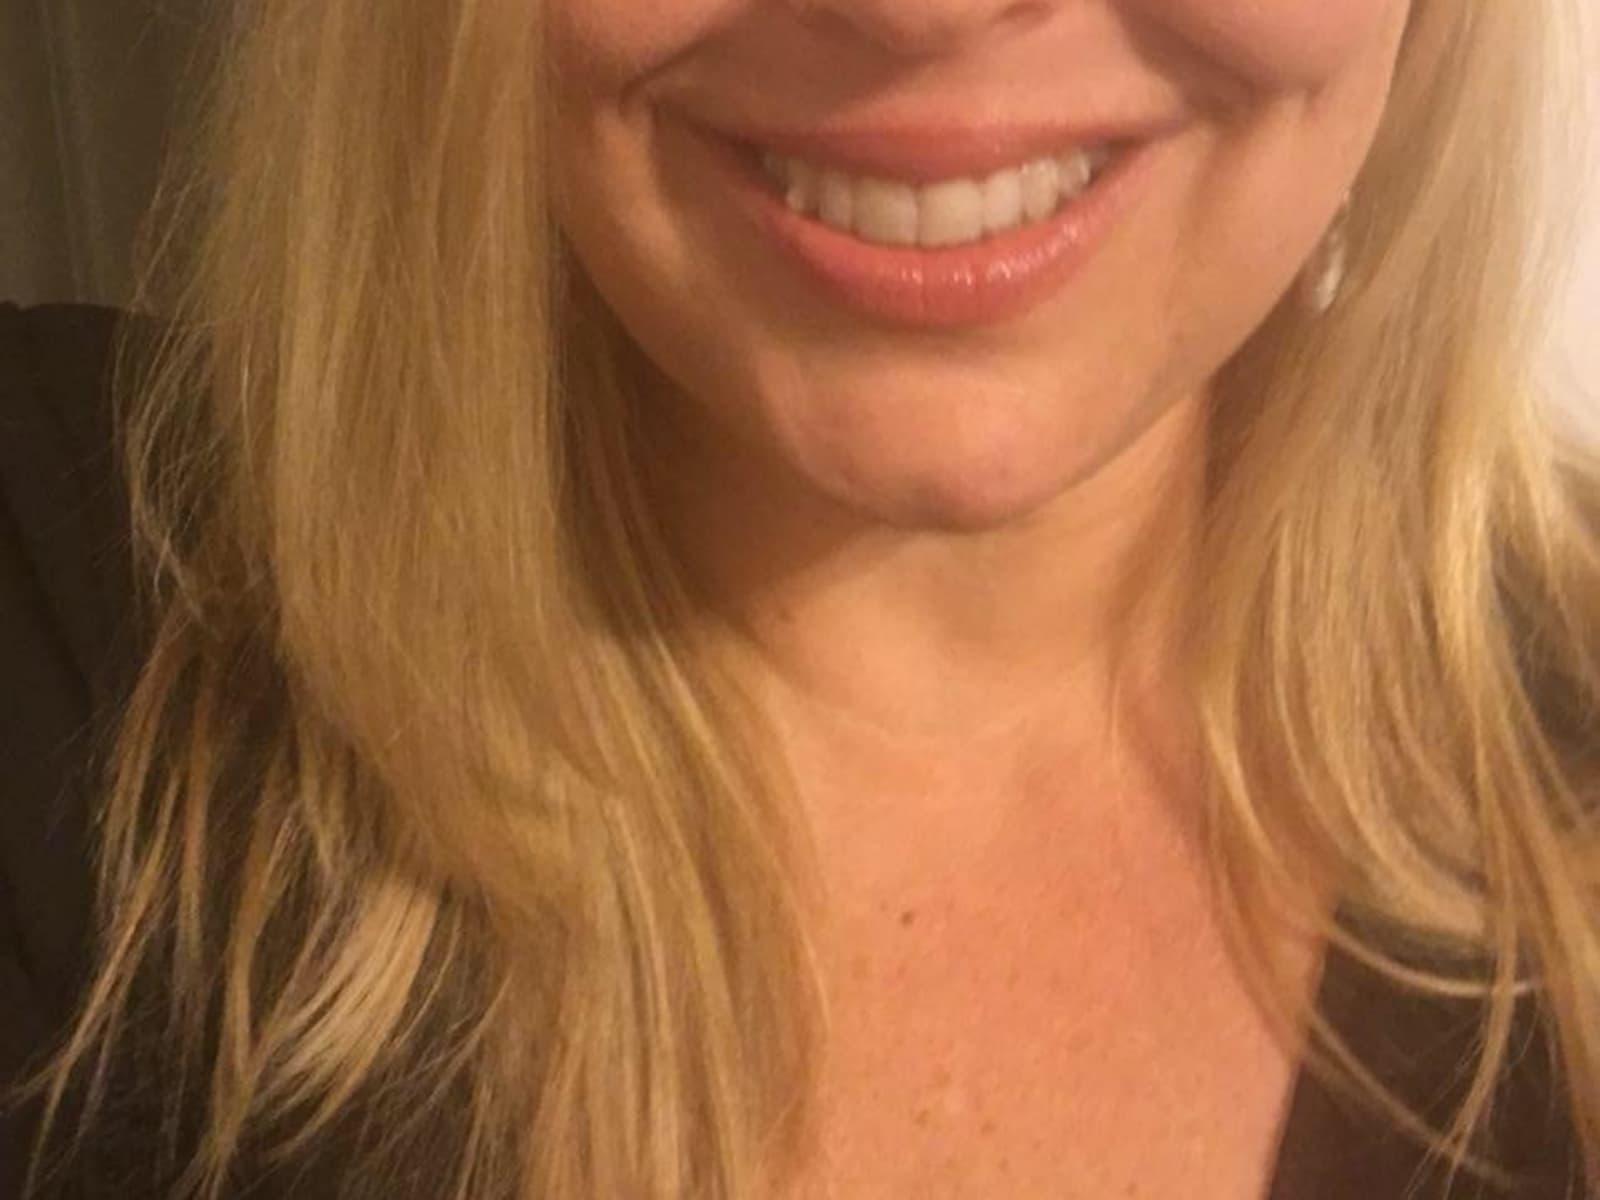 Deborah from Marshfield, Massachusetts, United States